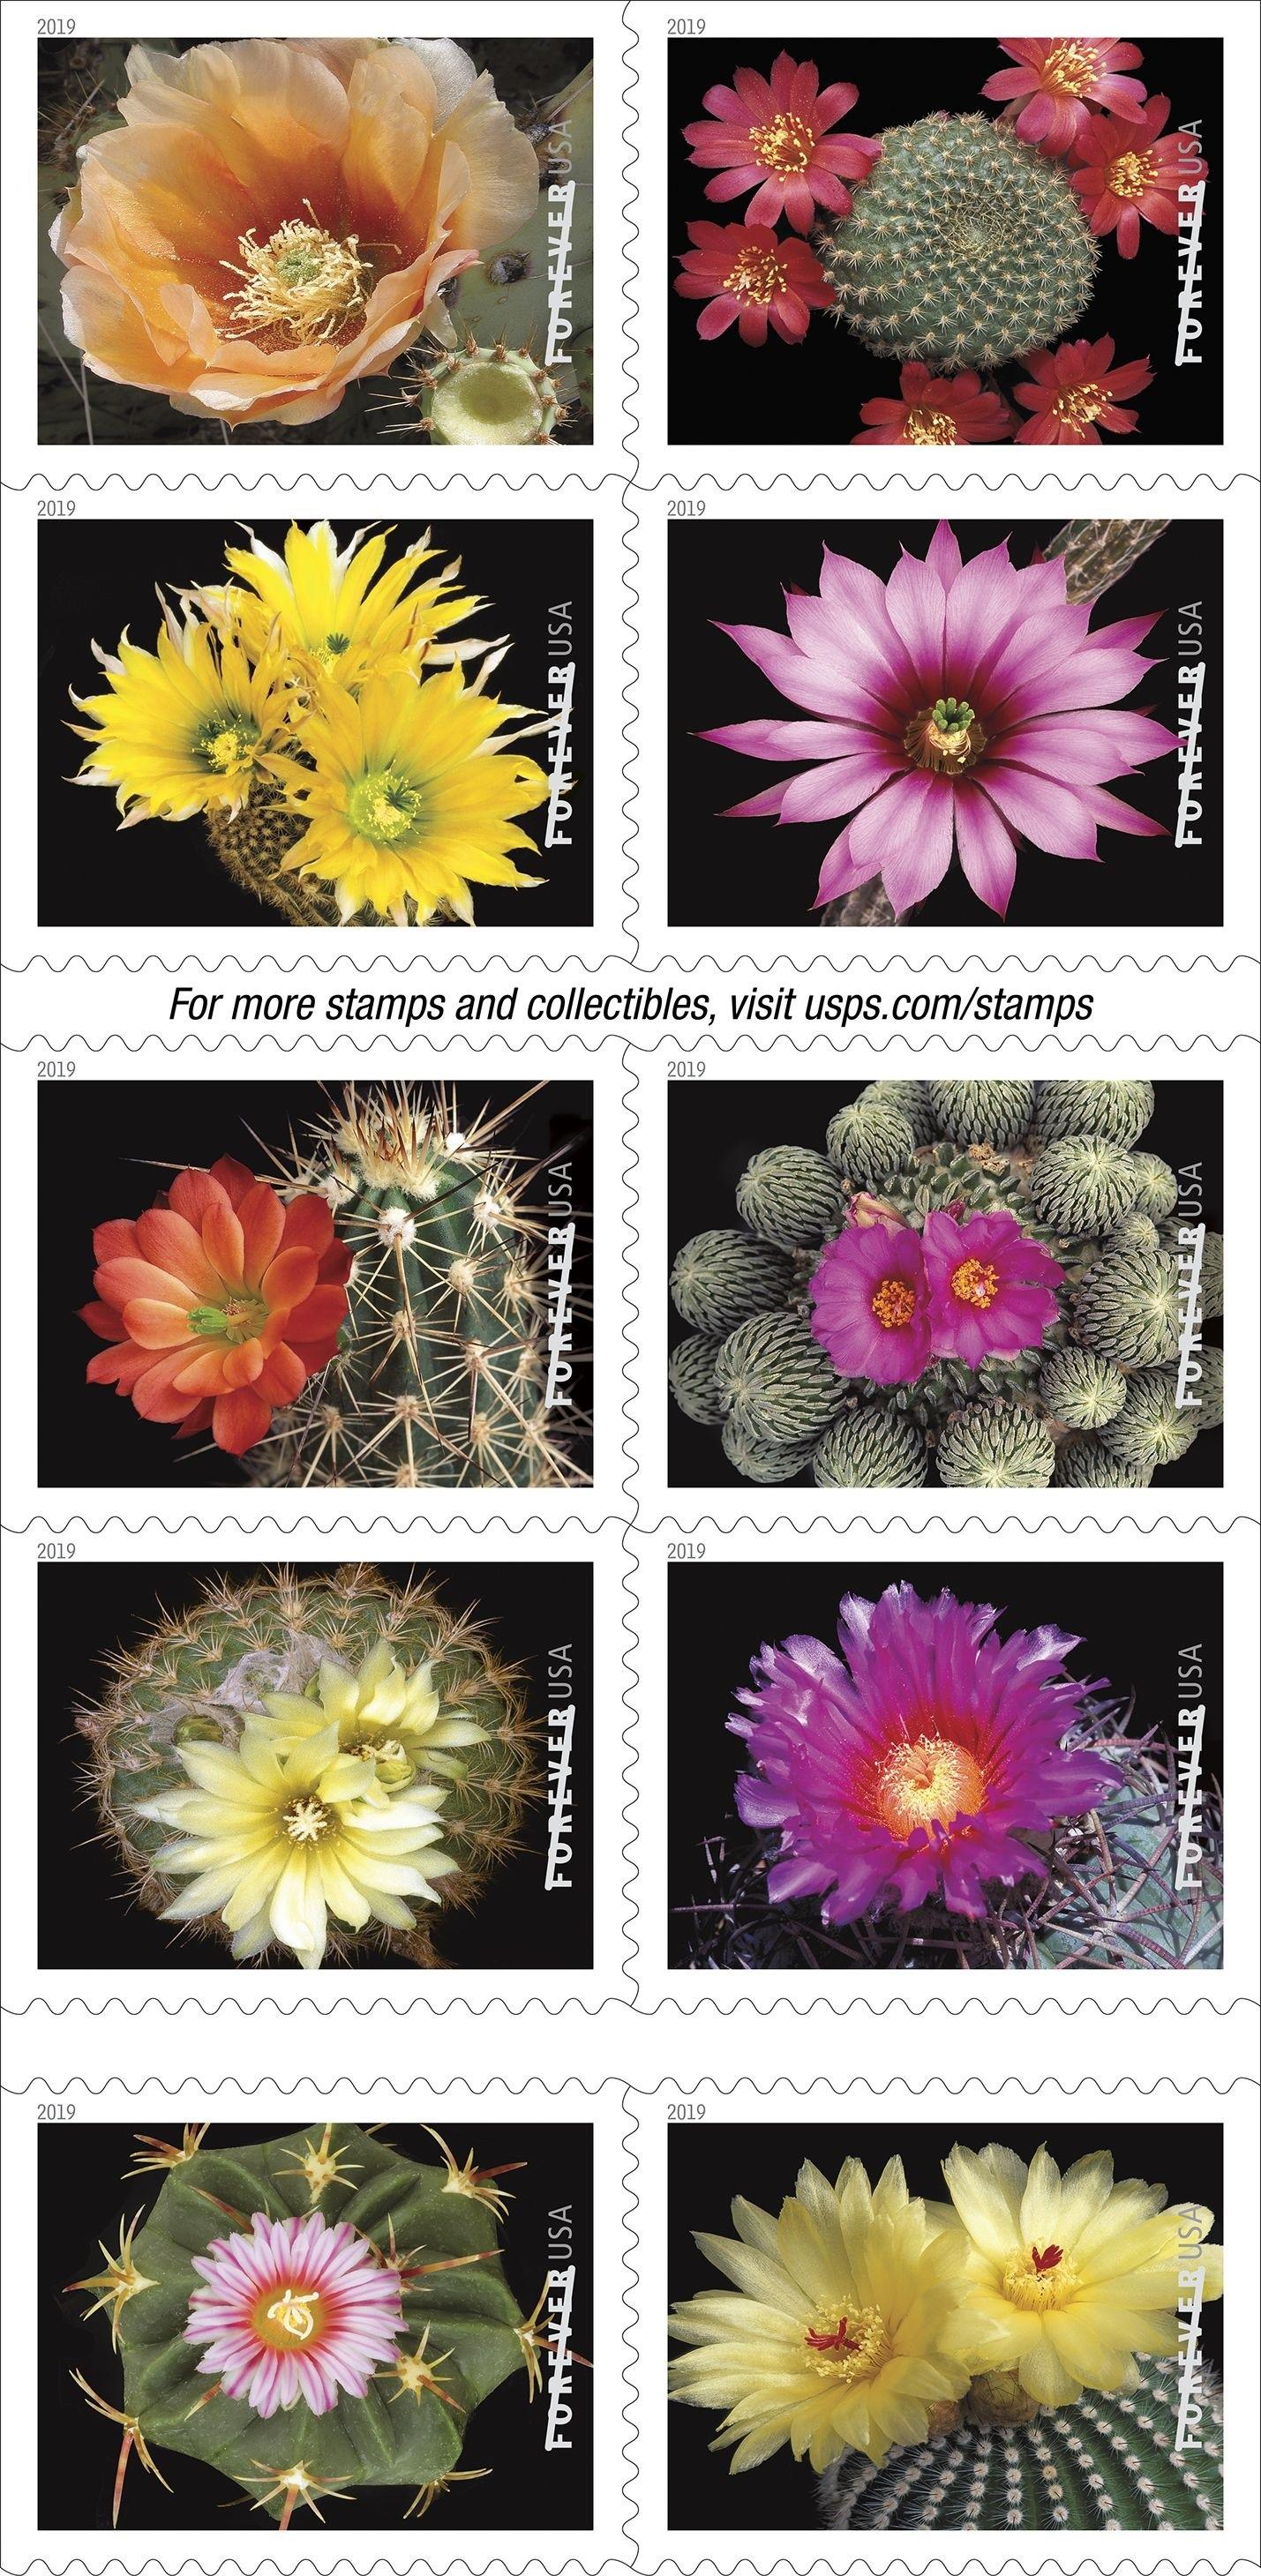 USPS releases Cactus Flowers Forever stamps   postalnews.com